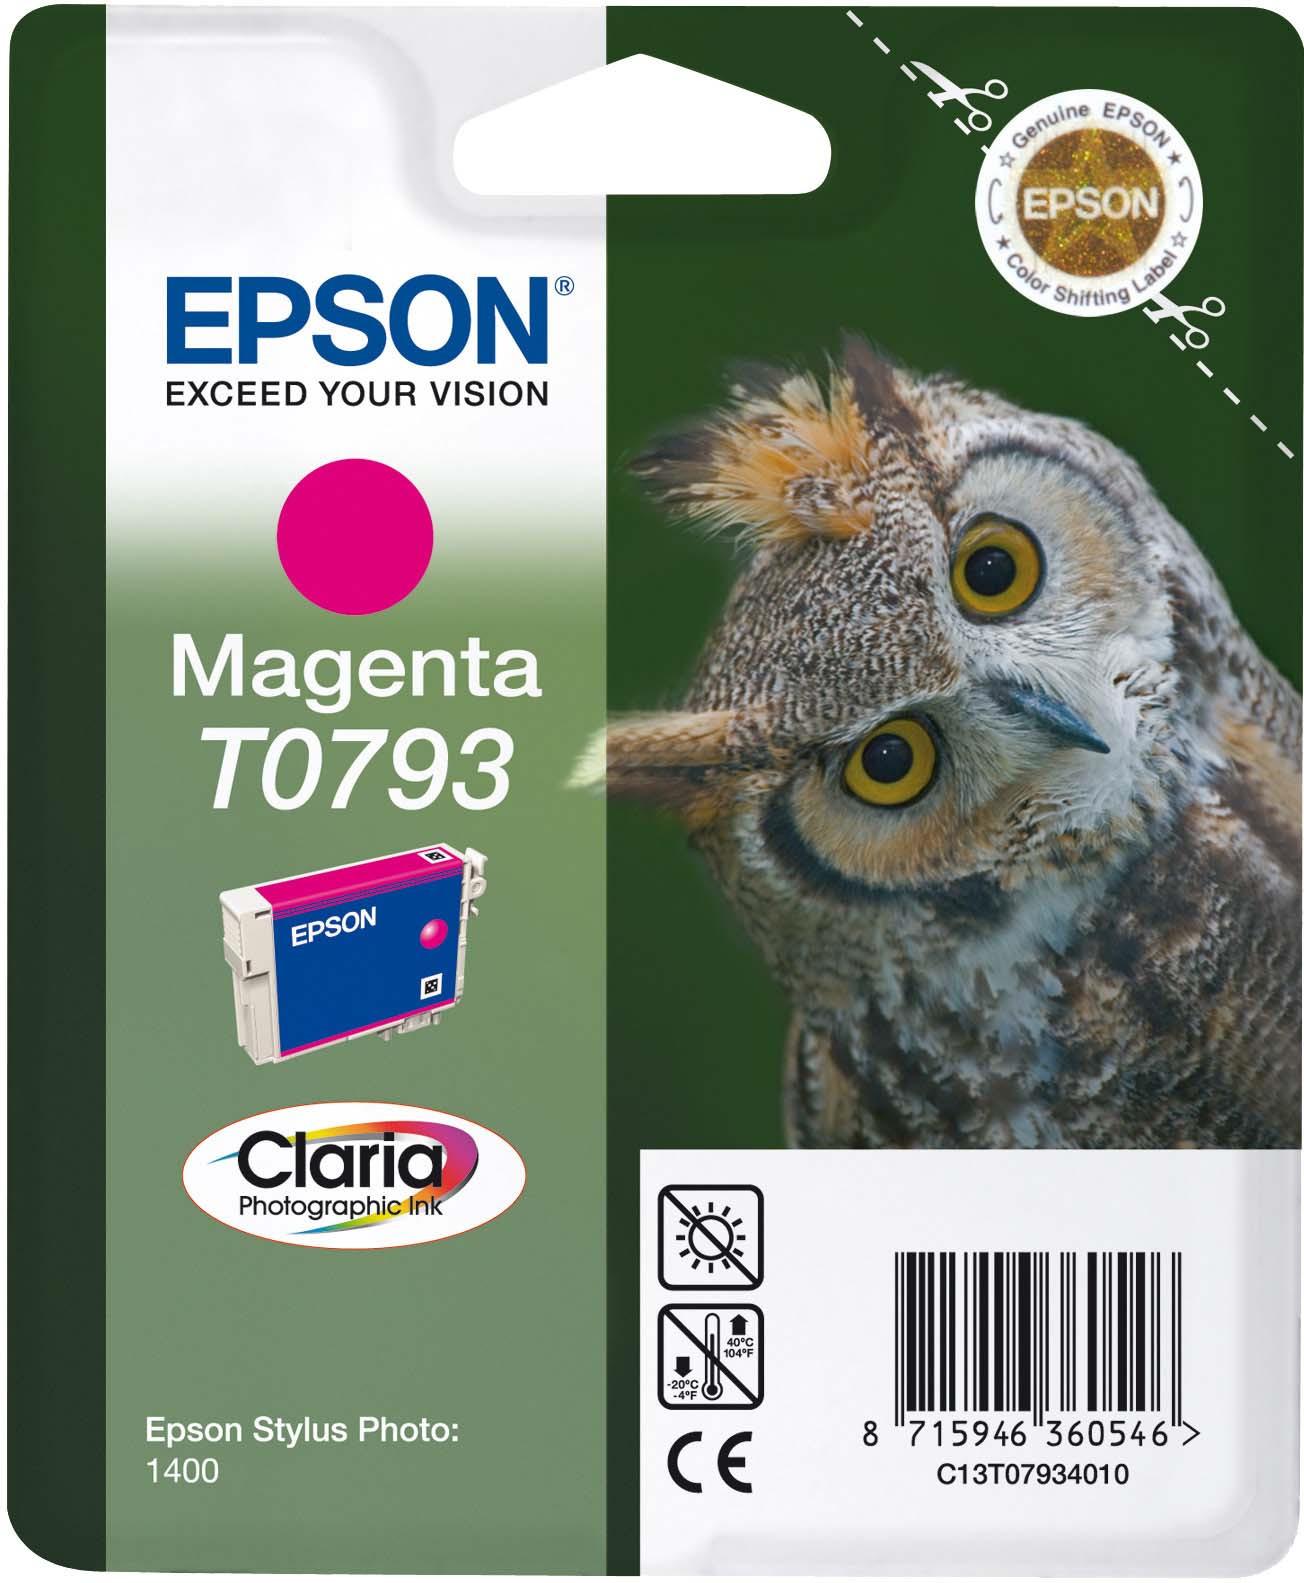 Картридж Epson C13T07934010 Magenta для принтеров Epson Stylus Photo 1500W, пурпурный картридж original epson [t034340] для epson stylus photo 2100 magenta